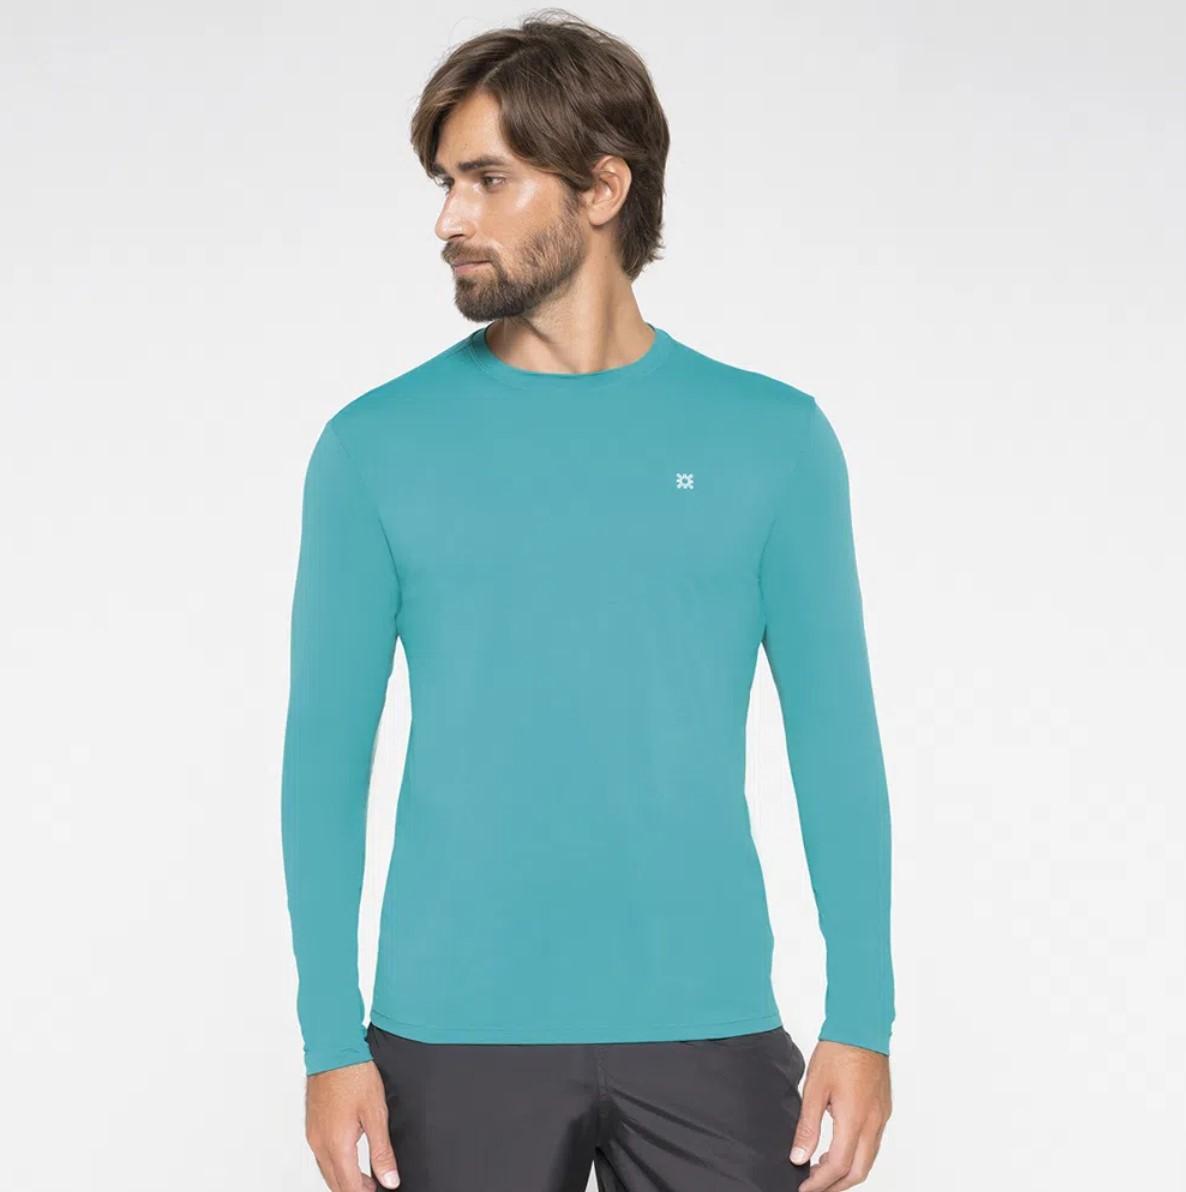 UV LINE Camiseta Uvpro Manga Longa Masculina Verde Hortelã Proteção Solar